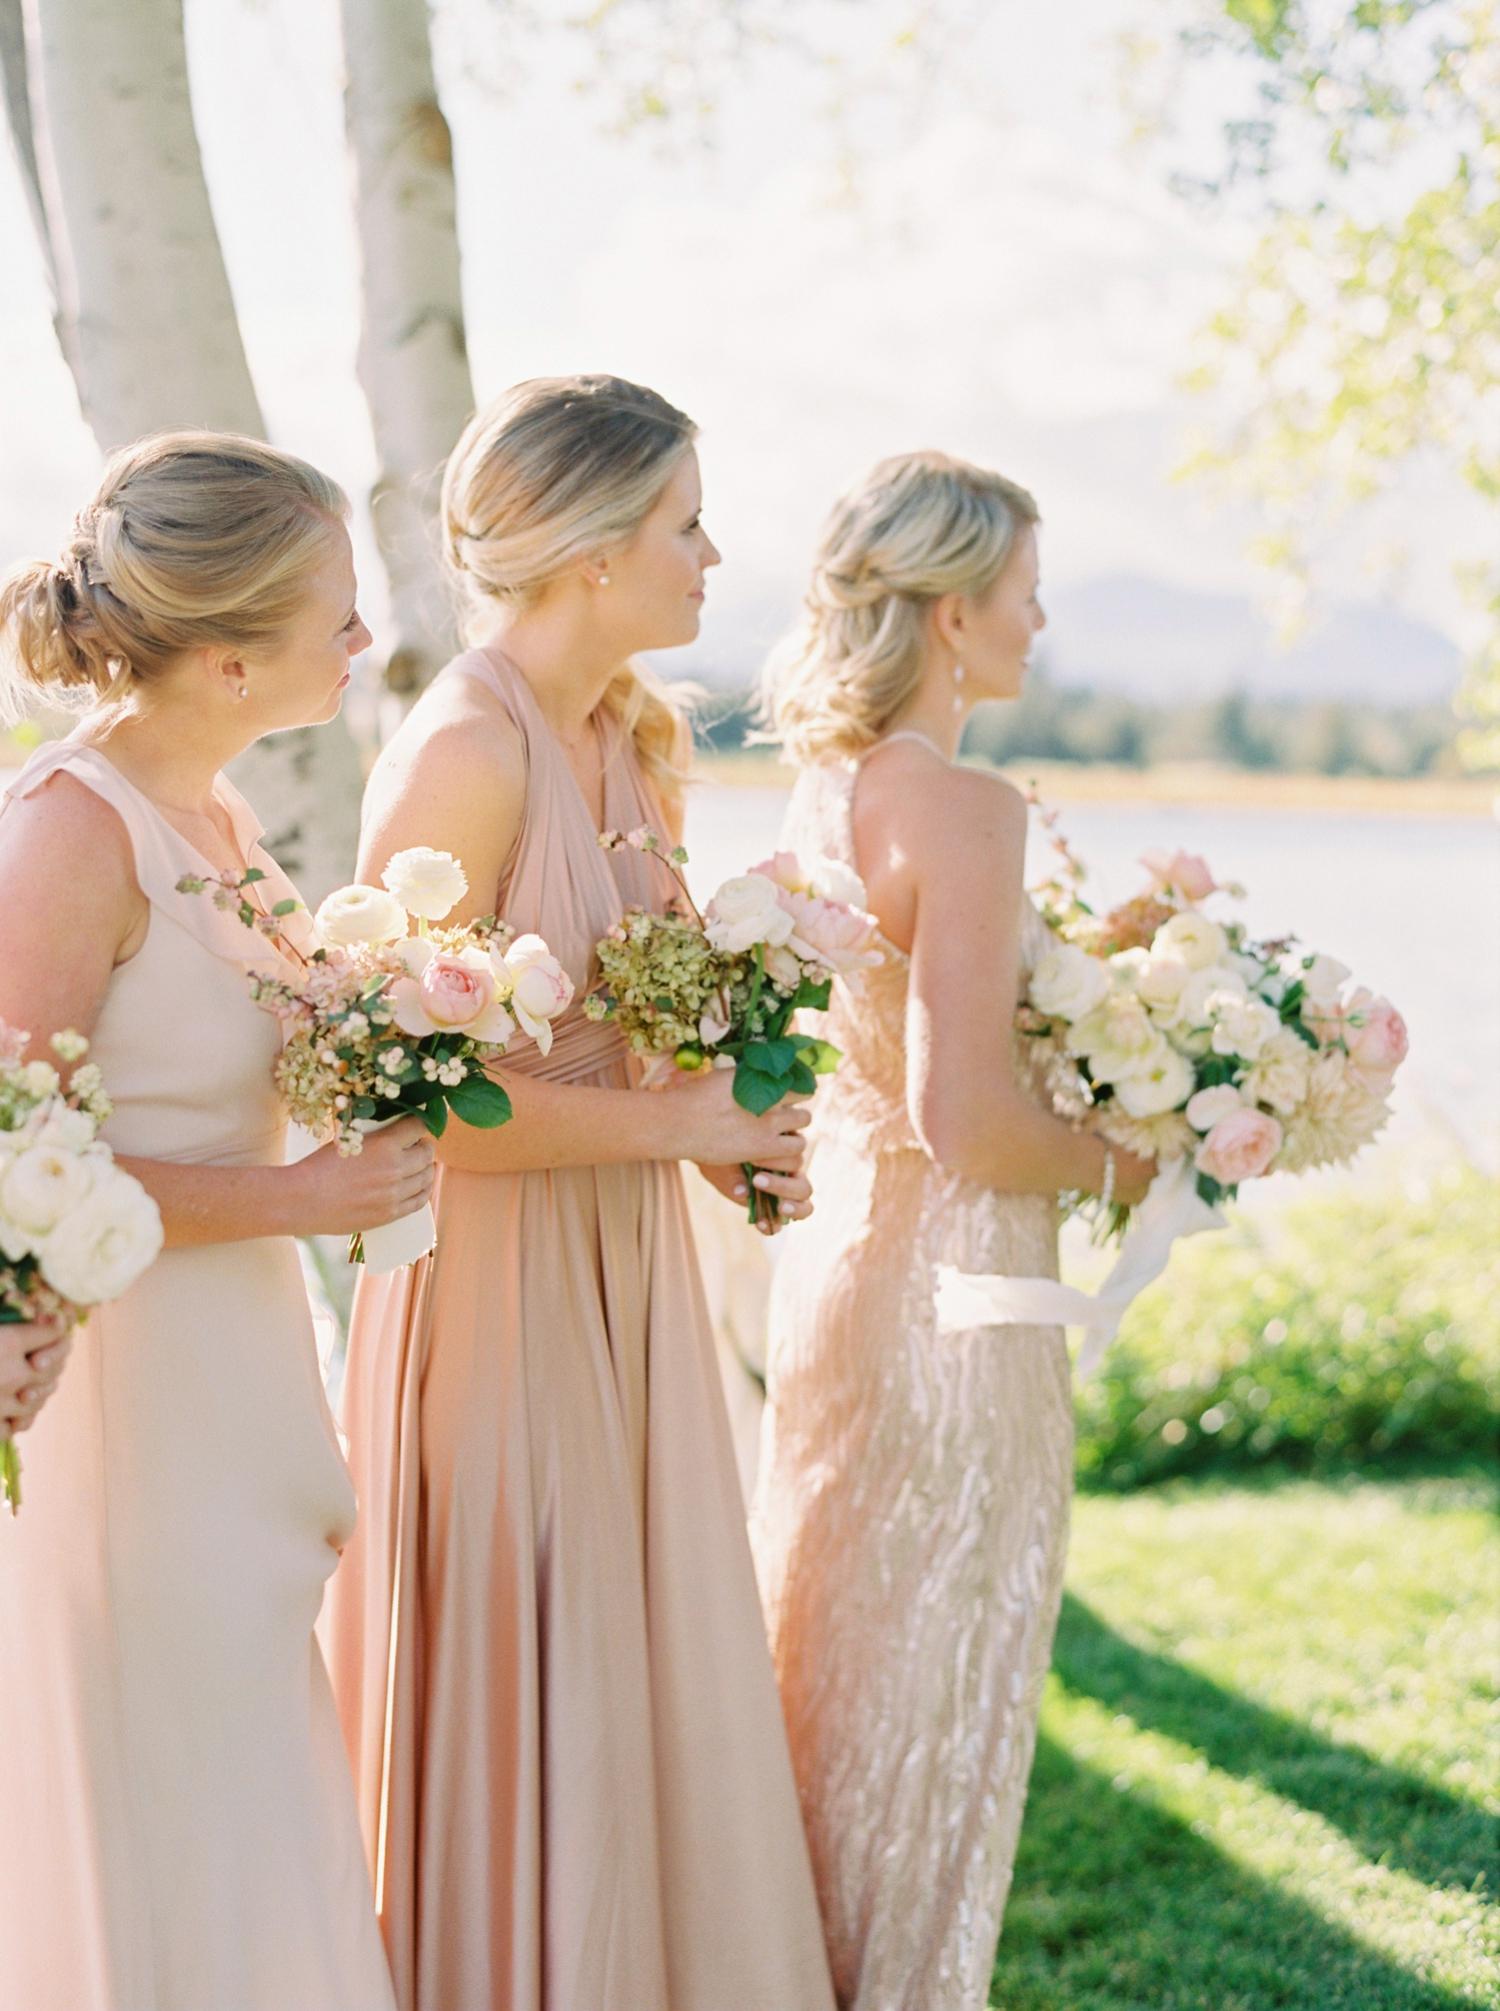 Calgary wedding photographers | oregon wedding photographers | fine art film | Justine Milton Photography | oregon wedding | wedding ceremony | bridesmaids | pastel bridesmaids dresses